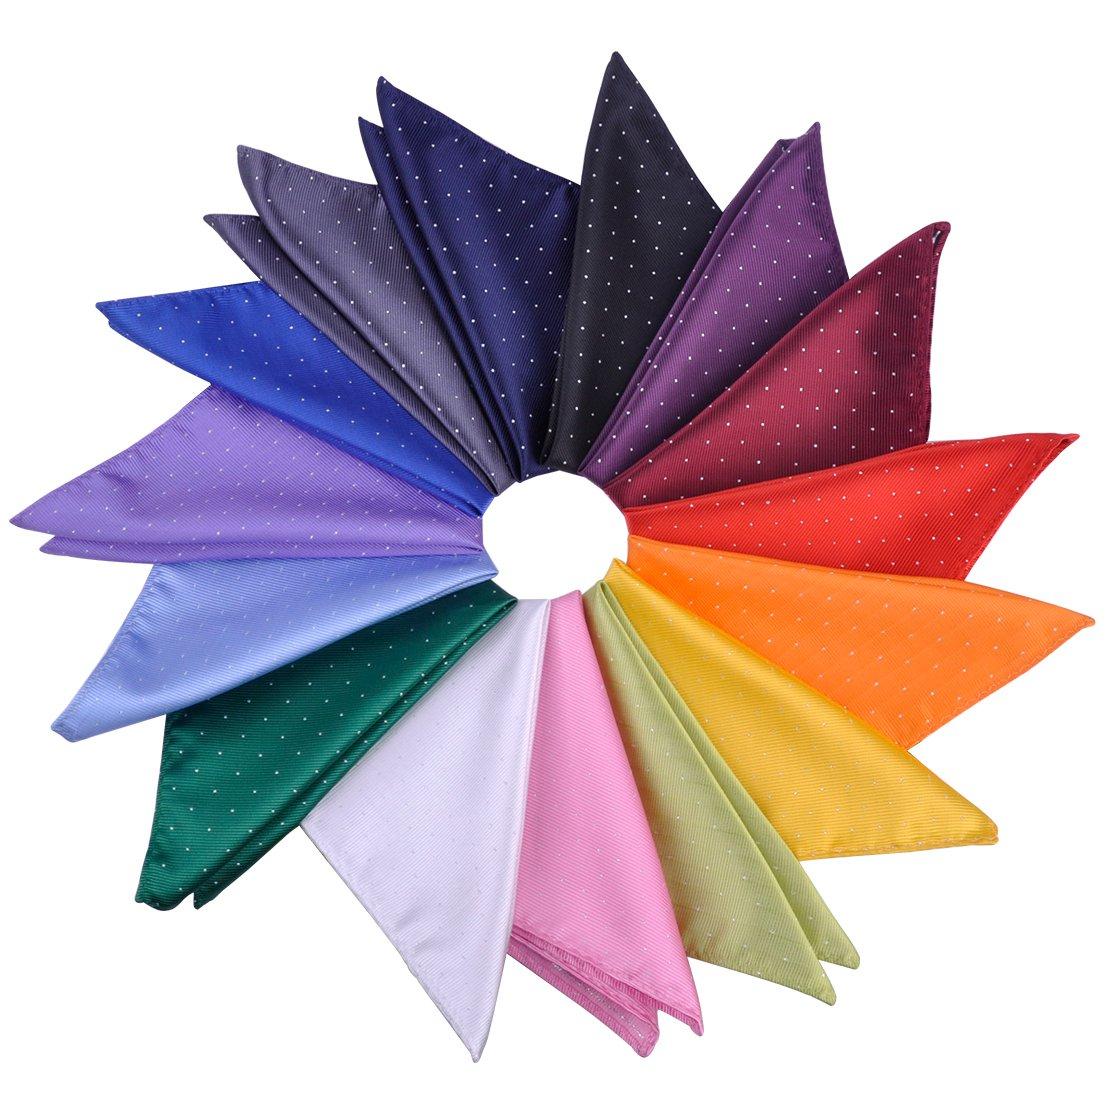 15 pcs 12x12'' Men's Polka Dot Pocket Square Jacquard Woven Handkerchief Gift ciciTree